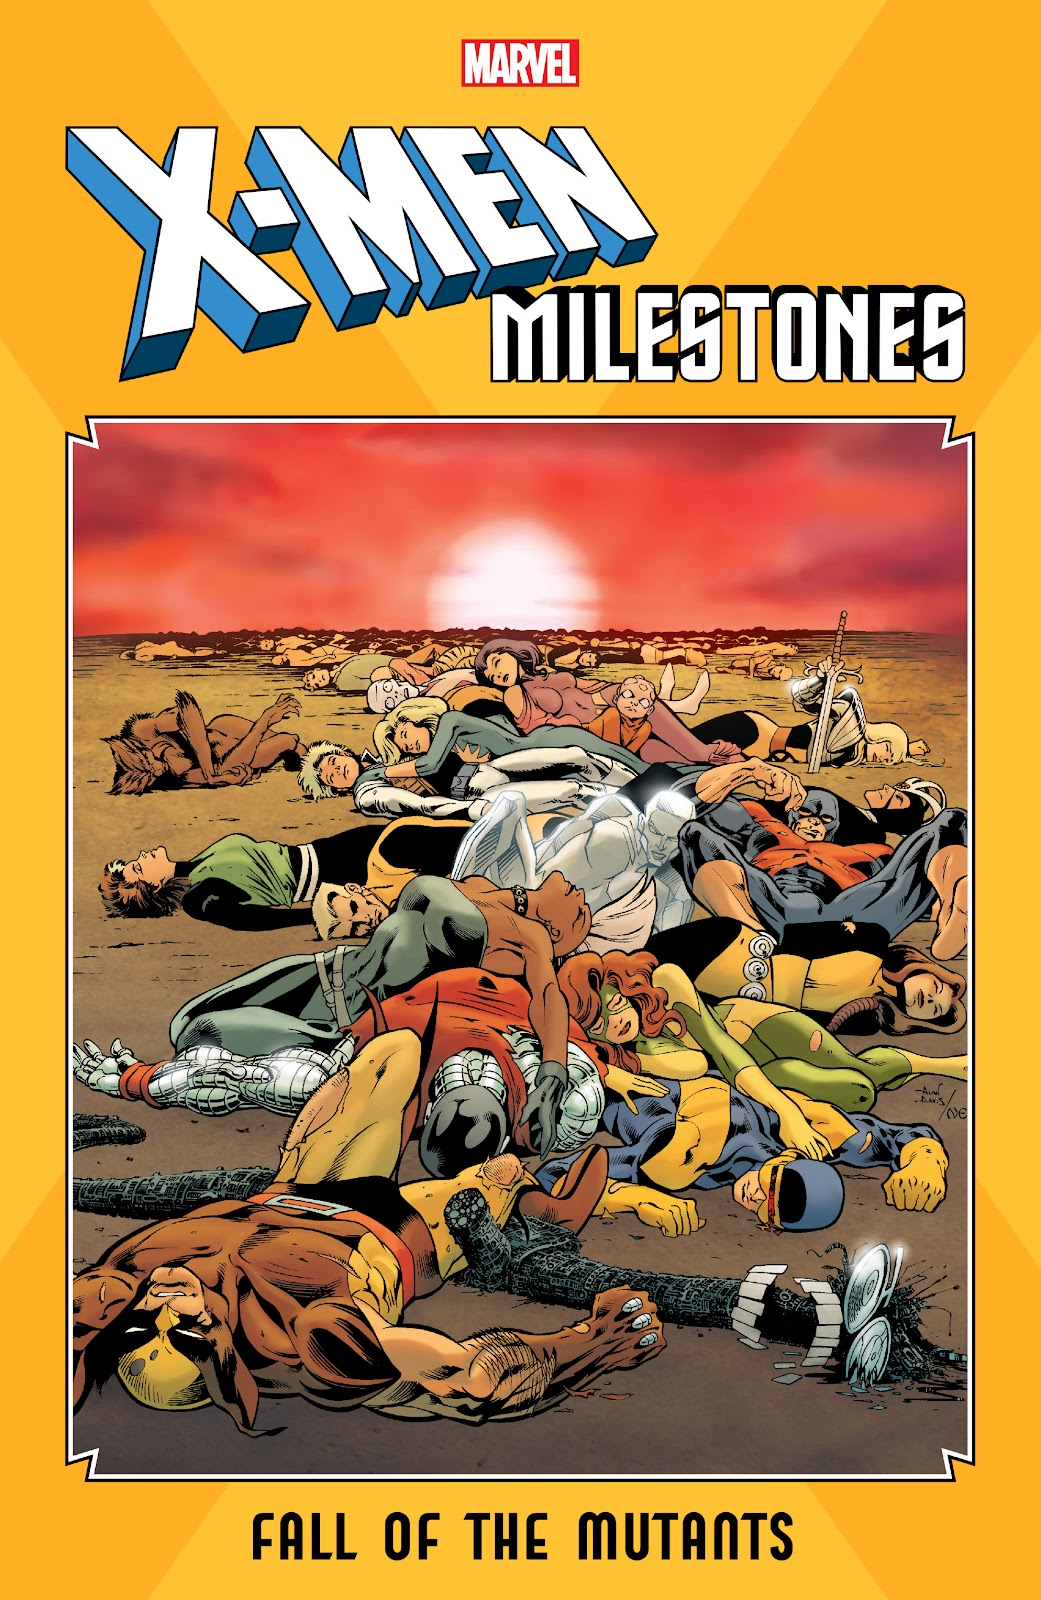 Read online X-Men Milestones: Fall of the Mutants comic -  Issue # TPB (Part 1) - 1